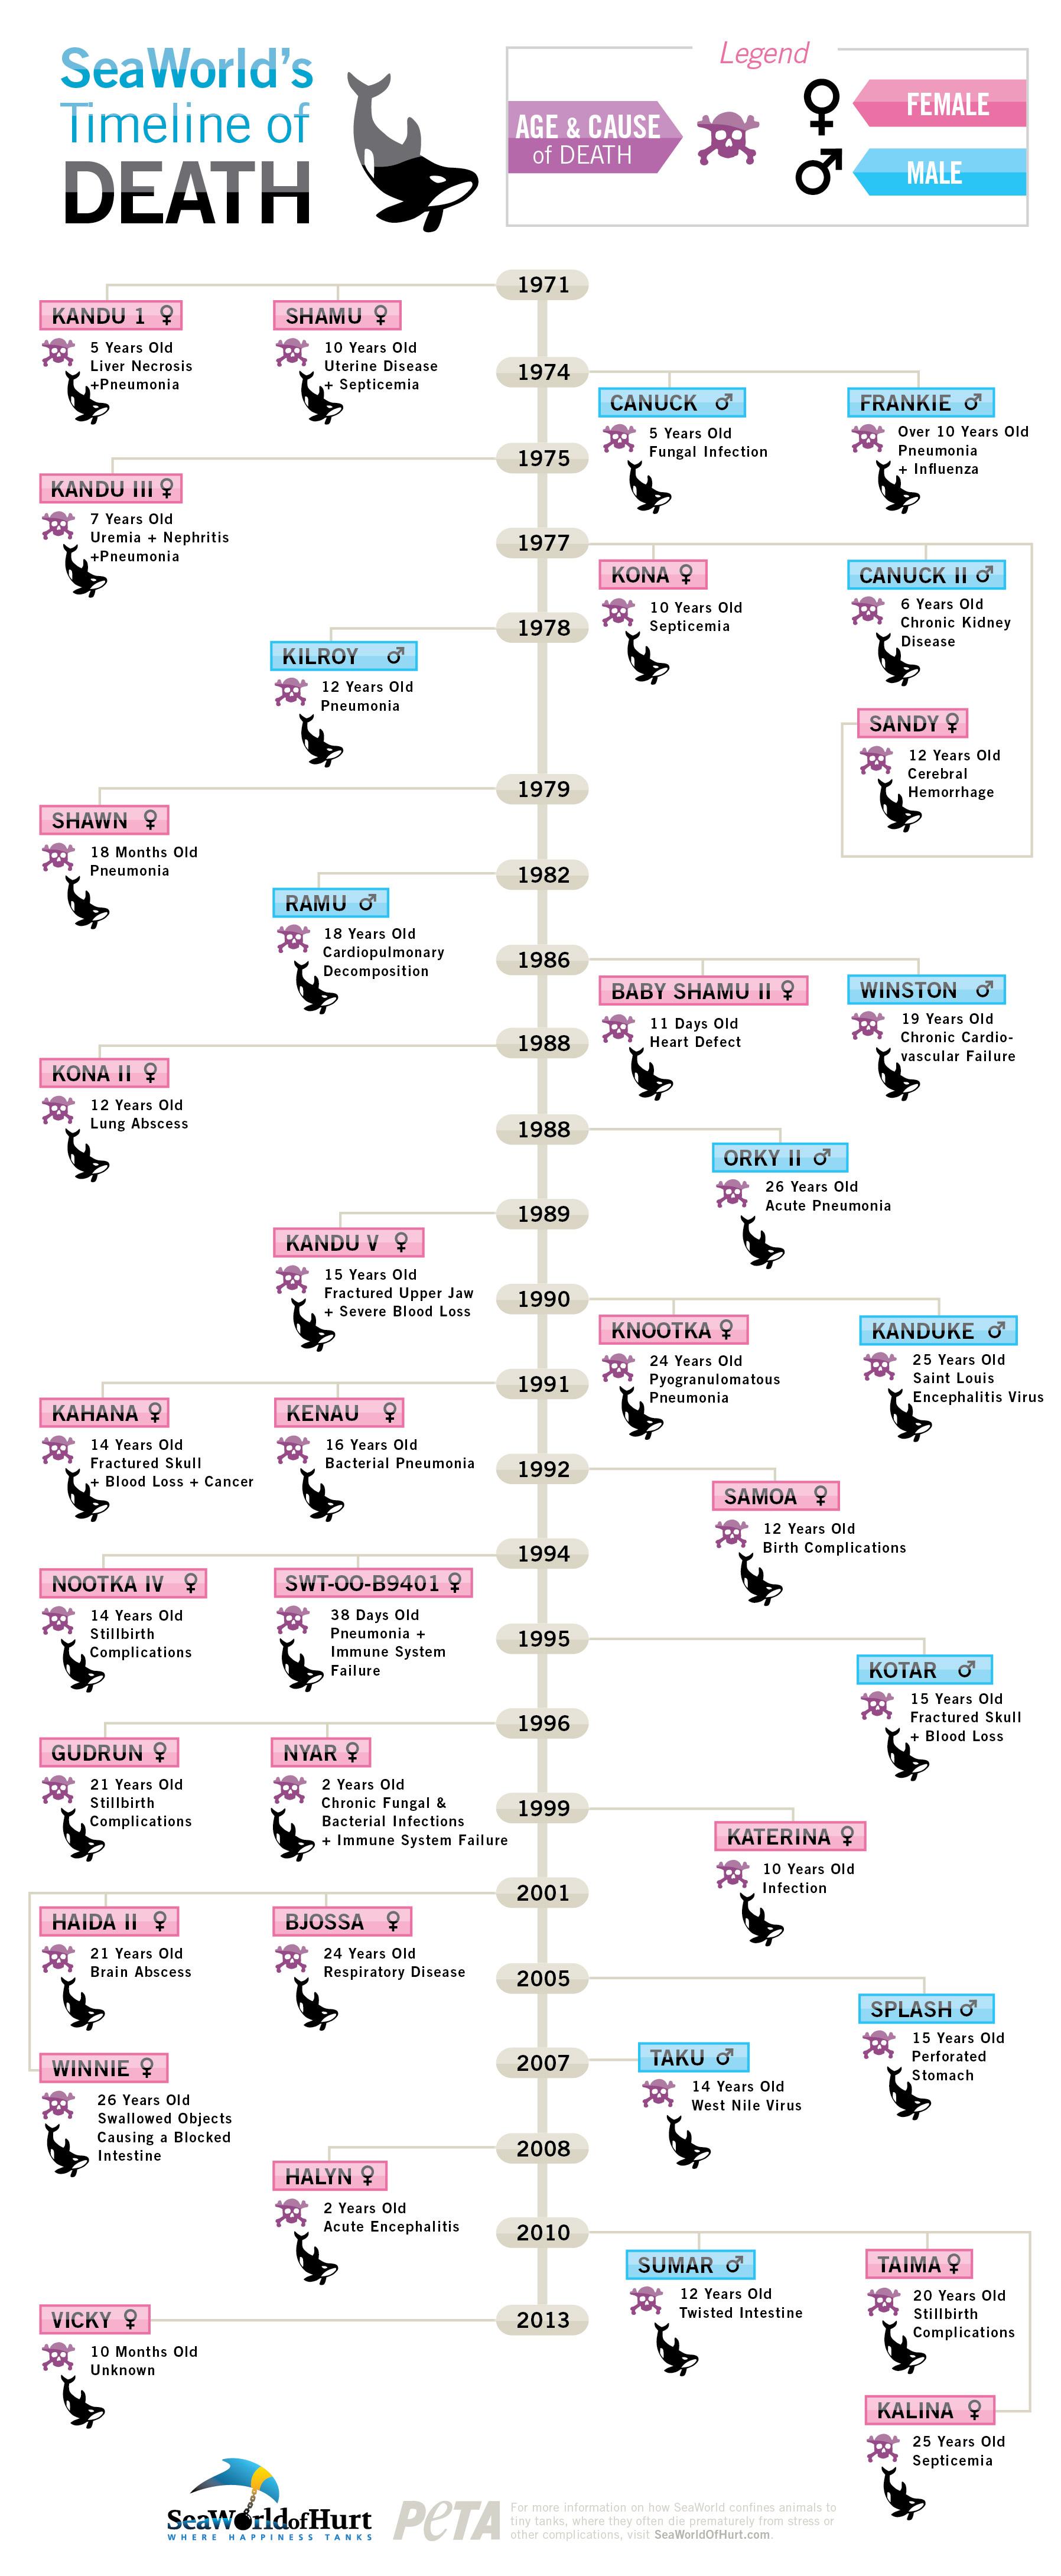 lives_stolen-infographic-1205